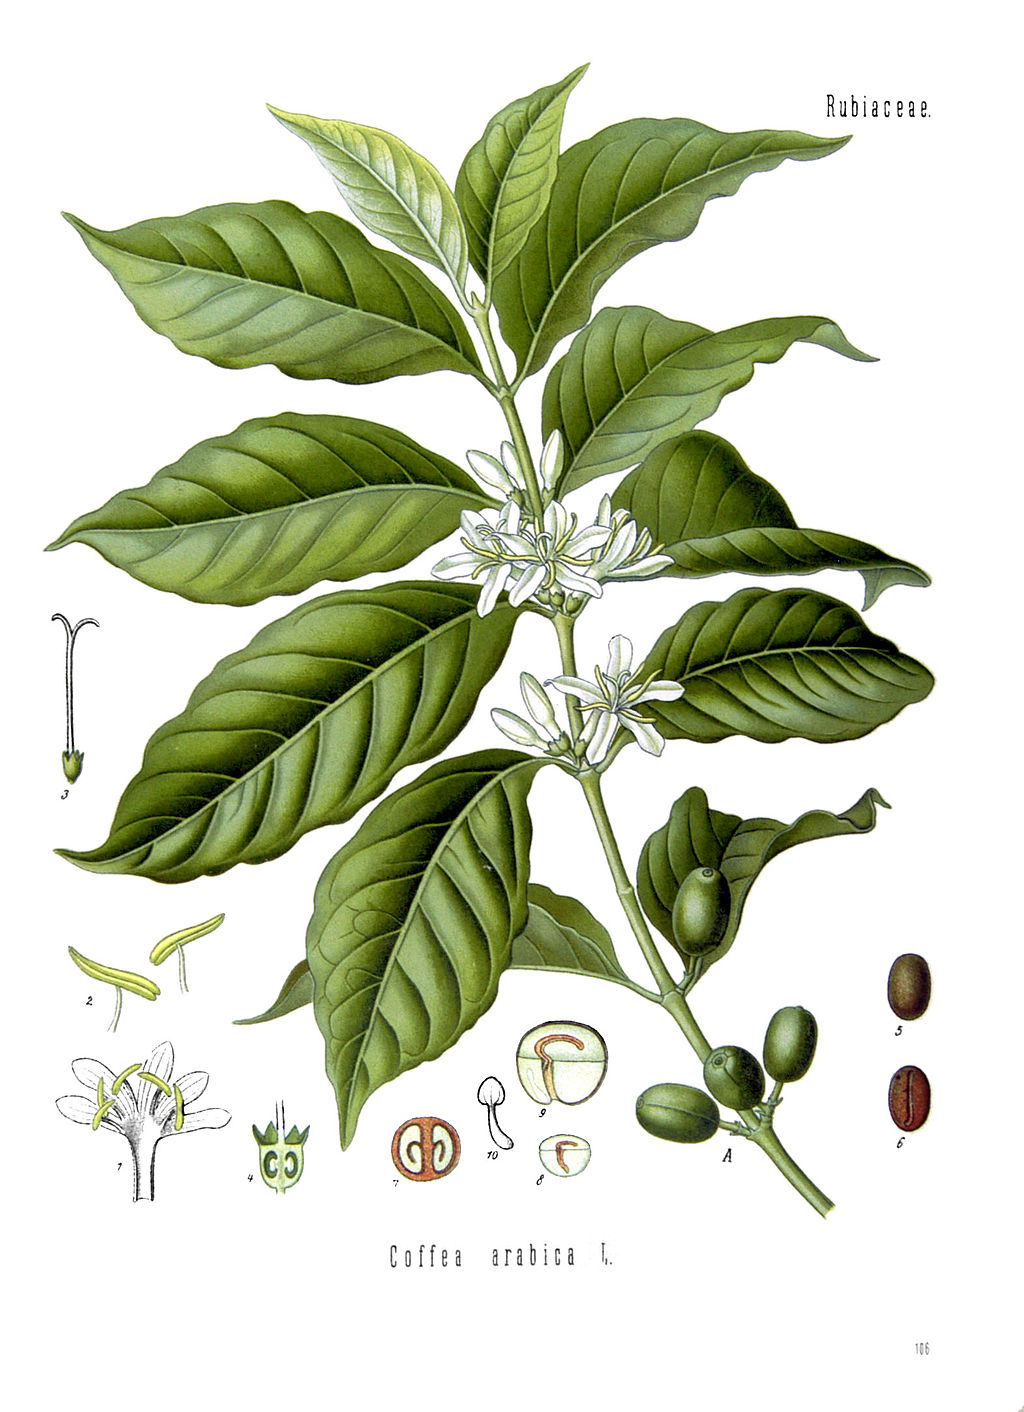 Illustration of coffee plant